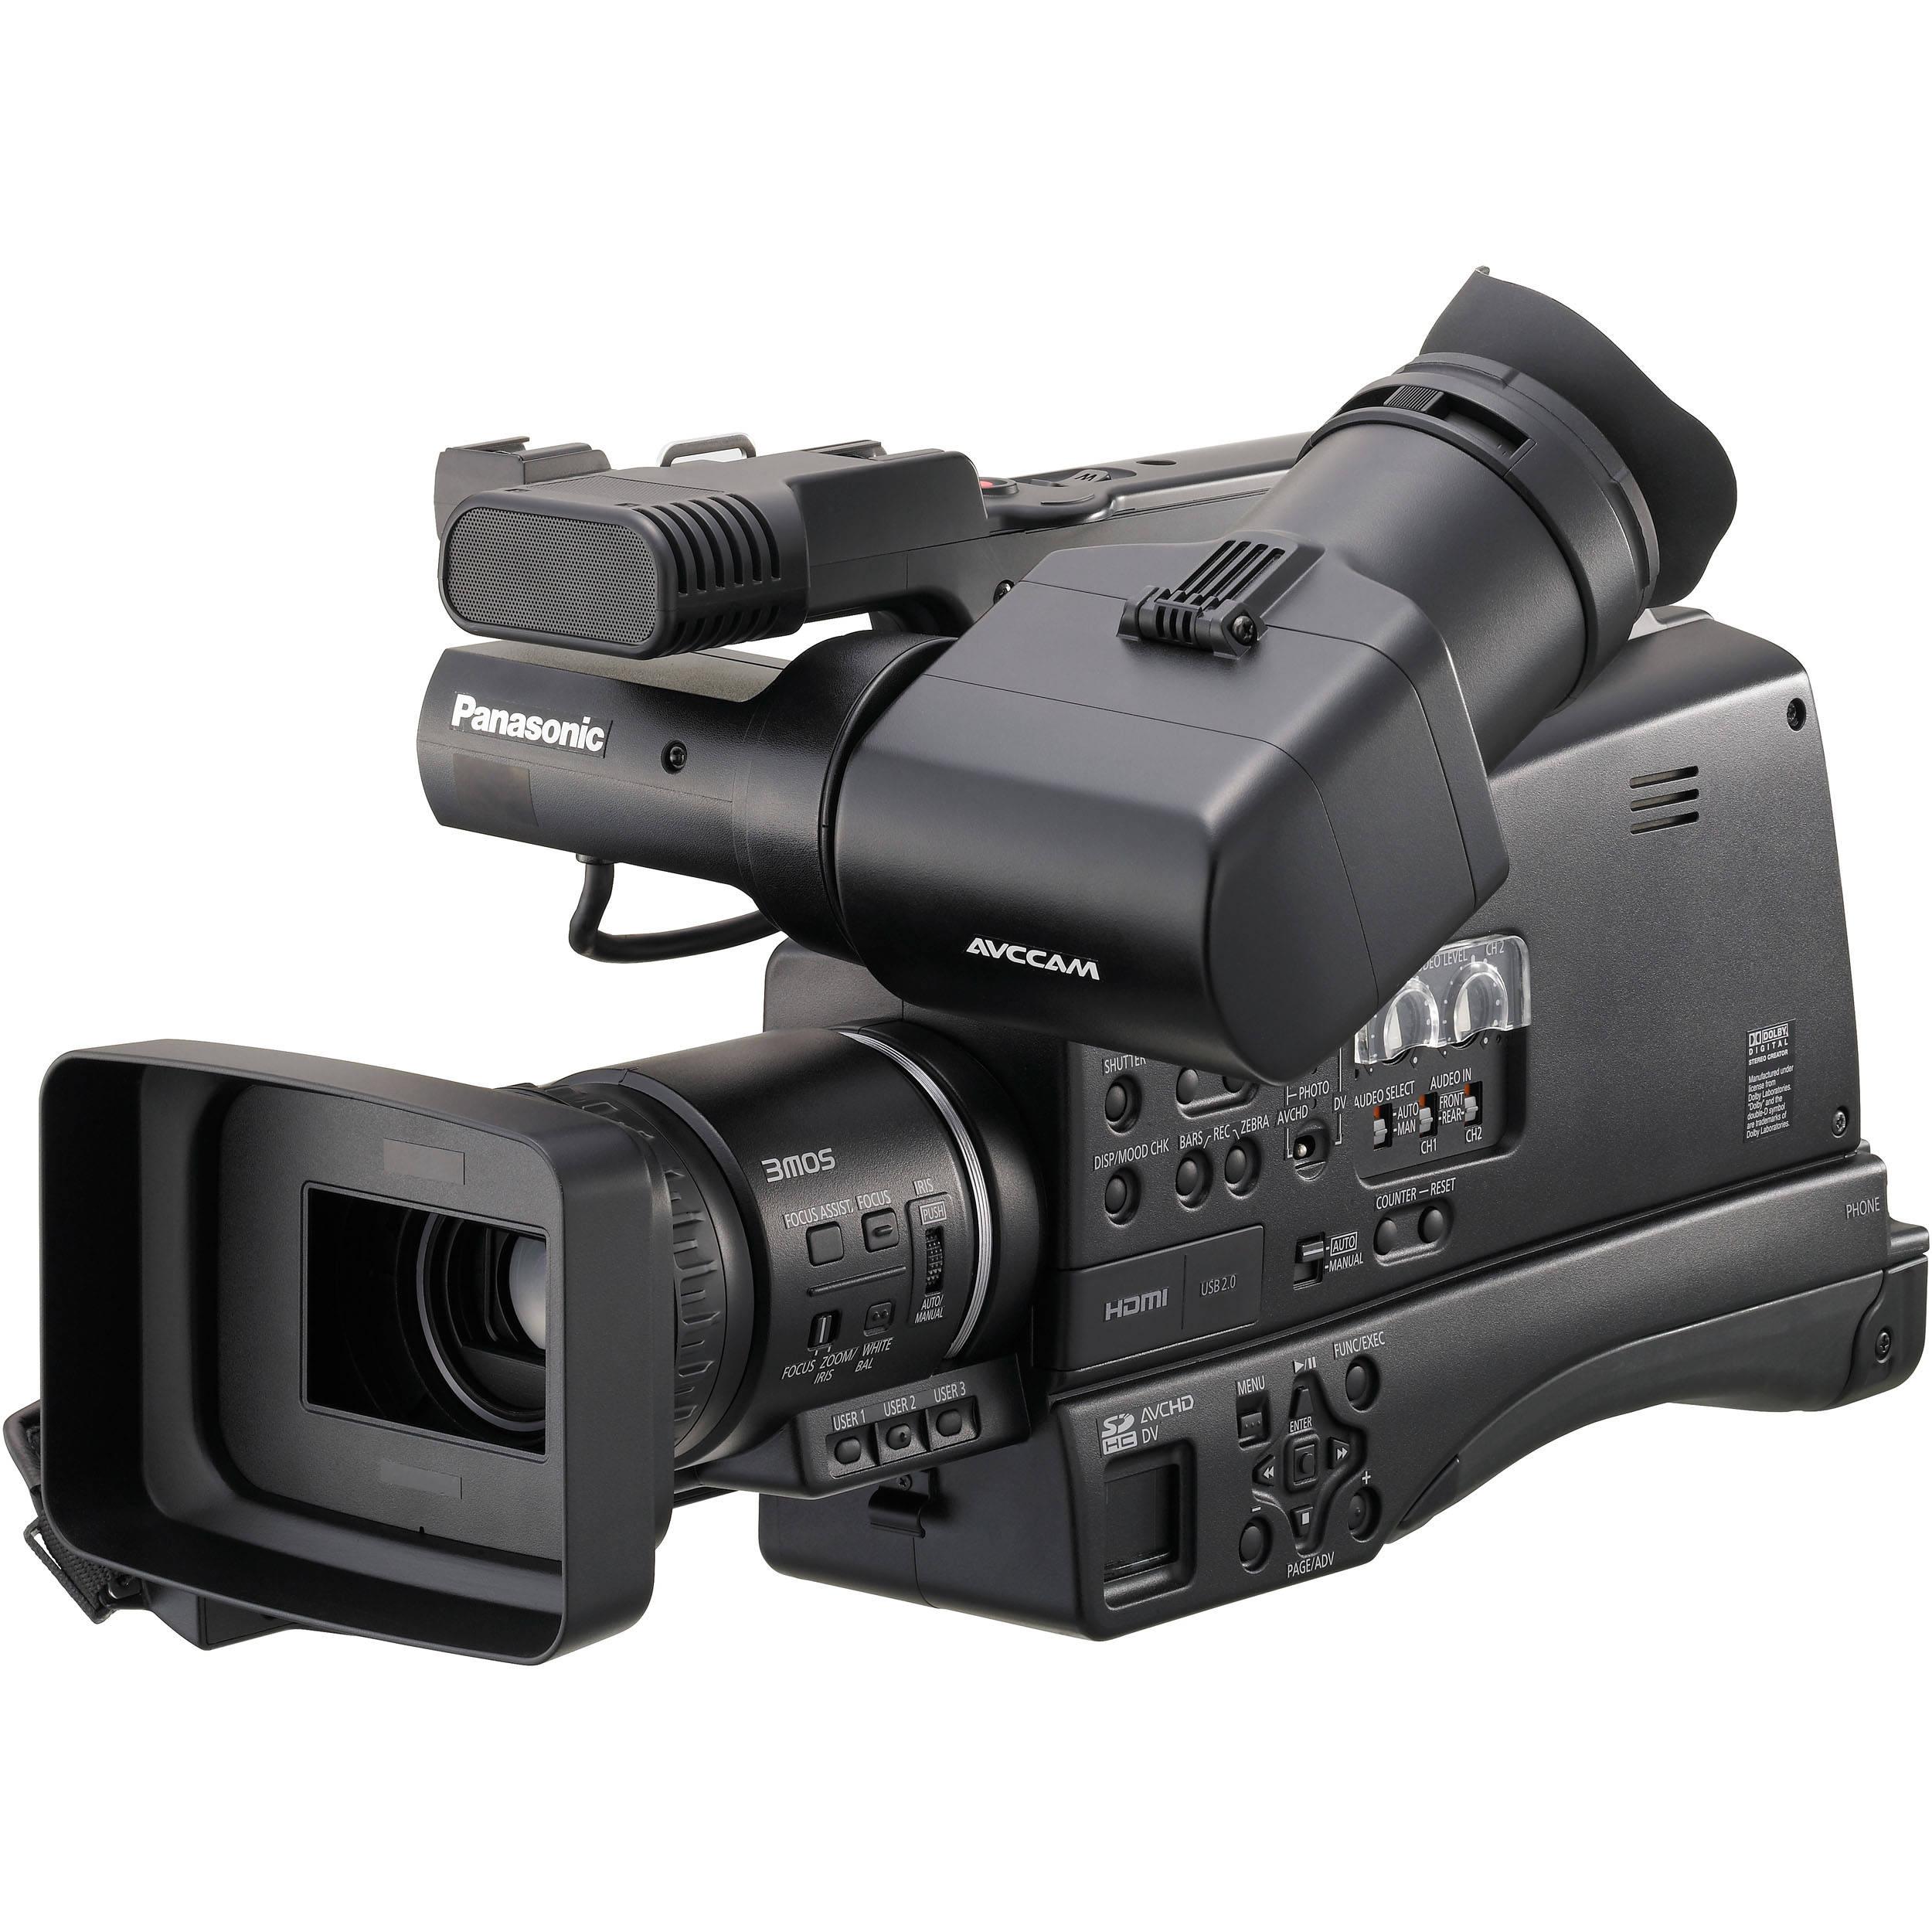 used panasonic ag hmc80 3mos avccam hd shoulder mount aghmc80pj rh bhphotovideo com AVCHD Camcorder Panasonic AG HMC40 Panasonic HMC-150